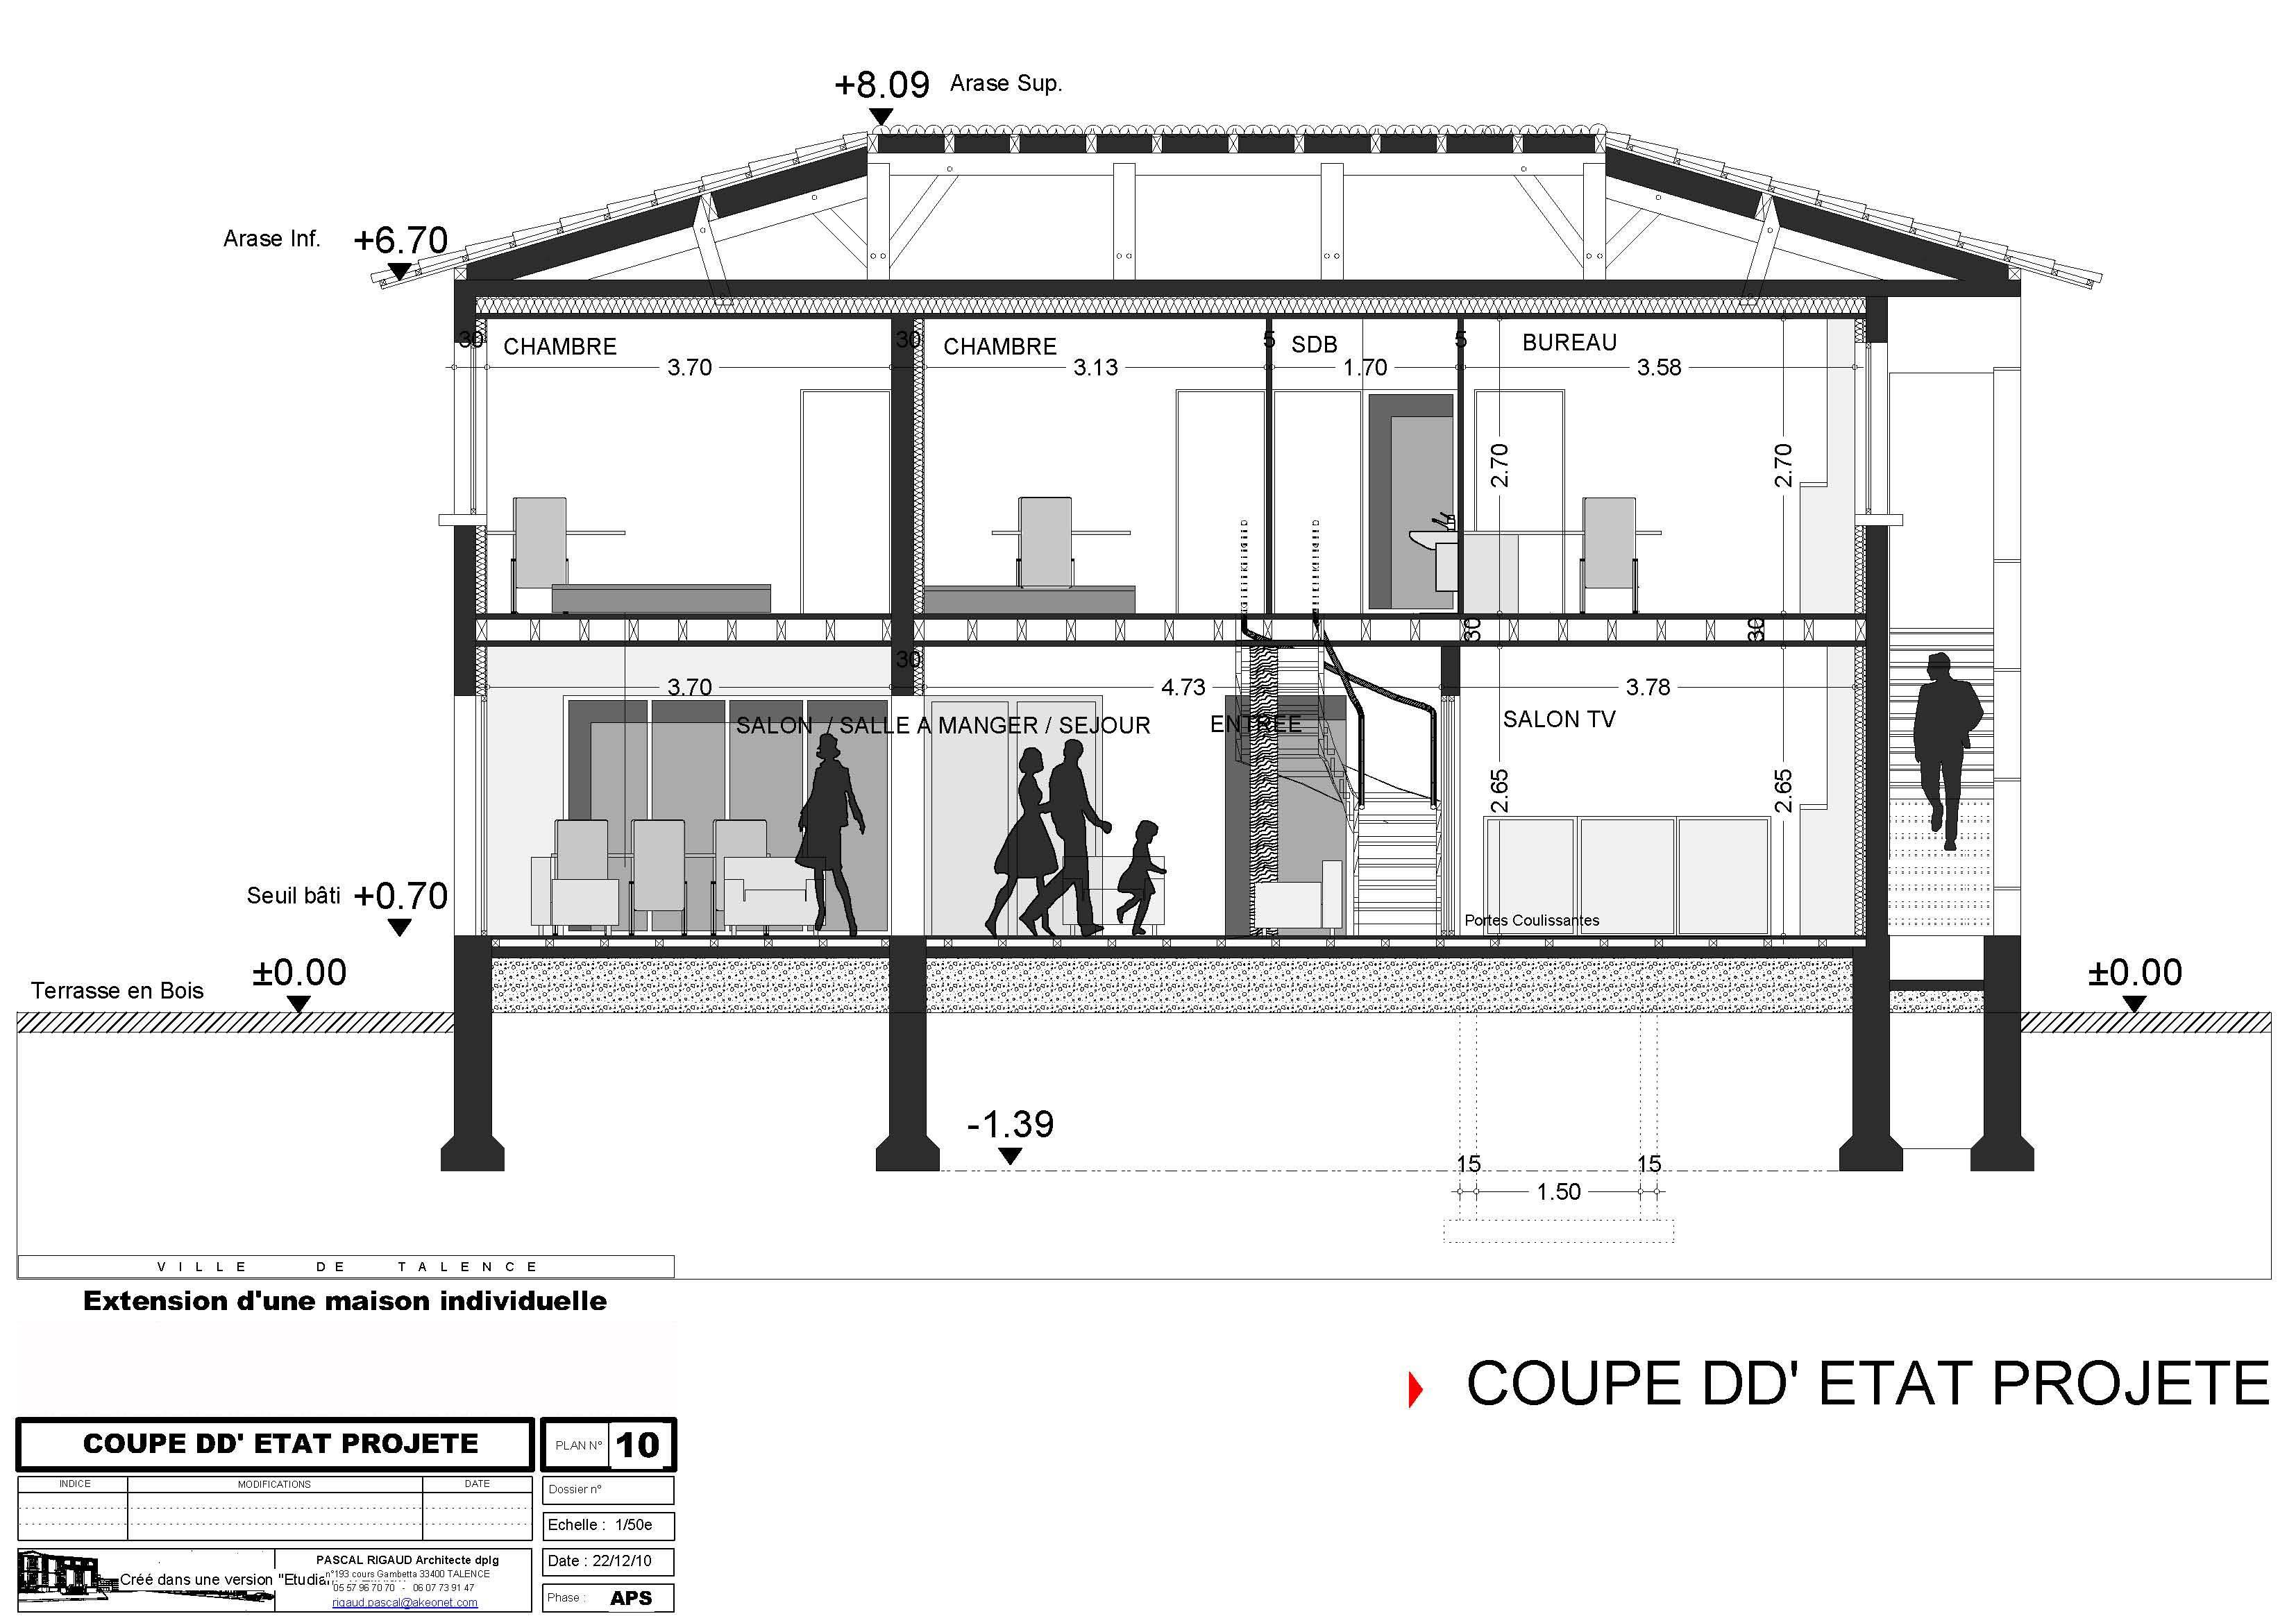 Coupe1 pascal rigaud architecte dplgpascal rigaud architecte dplg - Plan de coupe de maison ...